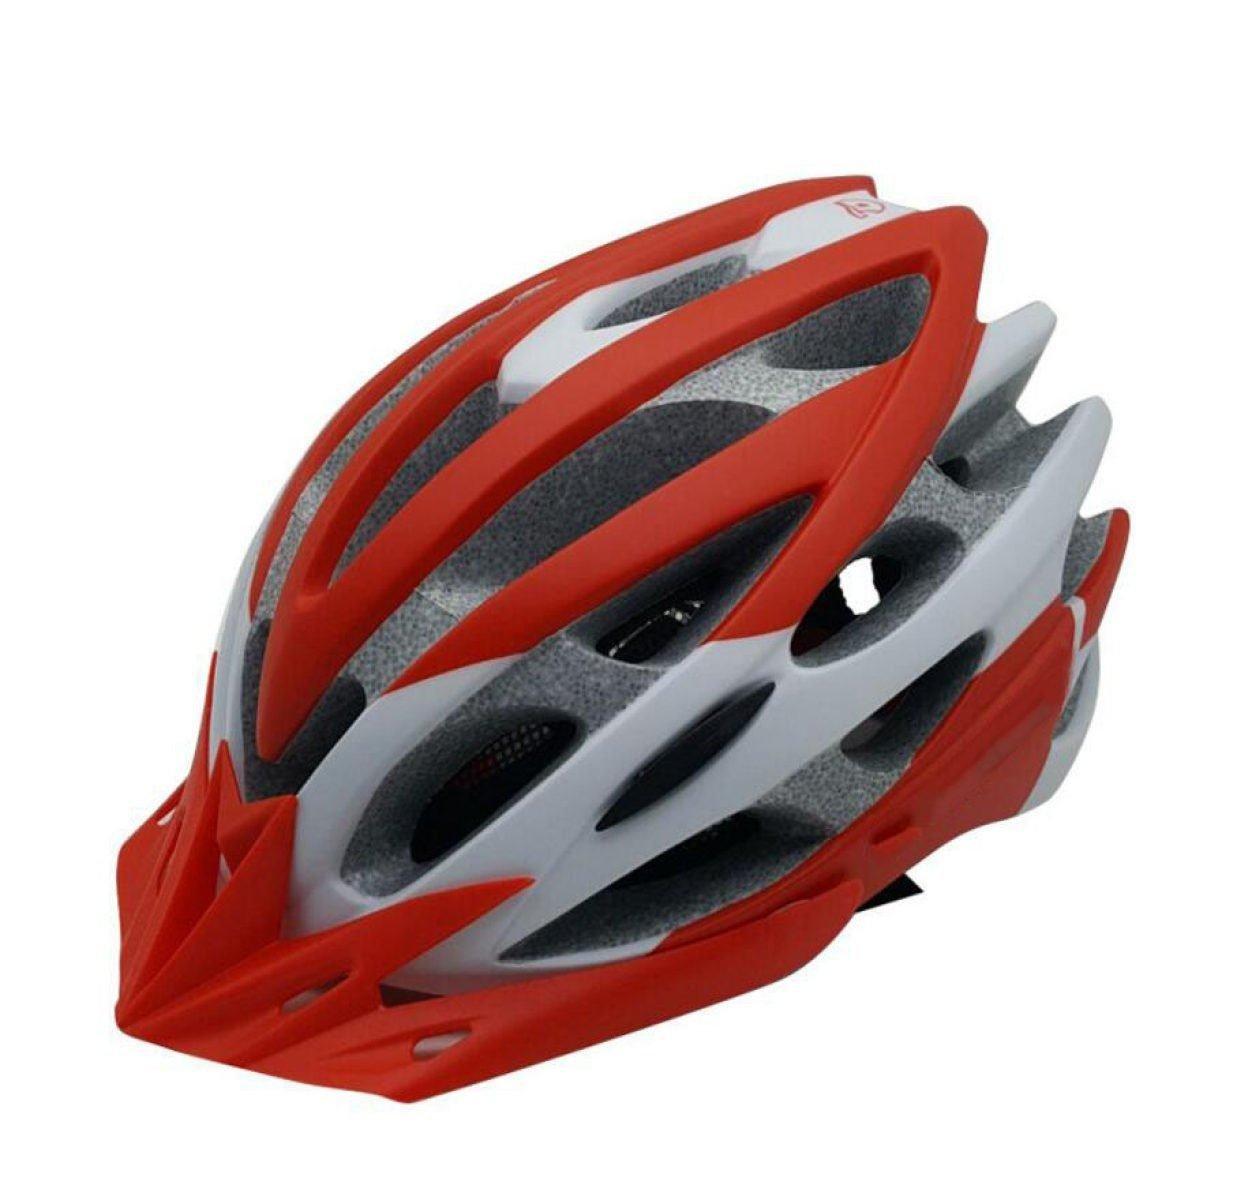 TERMV Fahrradhelm Abnehmbare Krempe Ultraleicht Erwachsenen Helm Schutzausrüstung,G